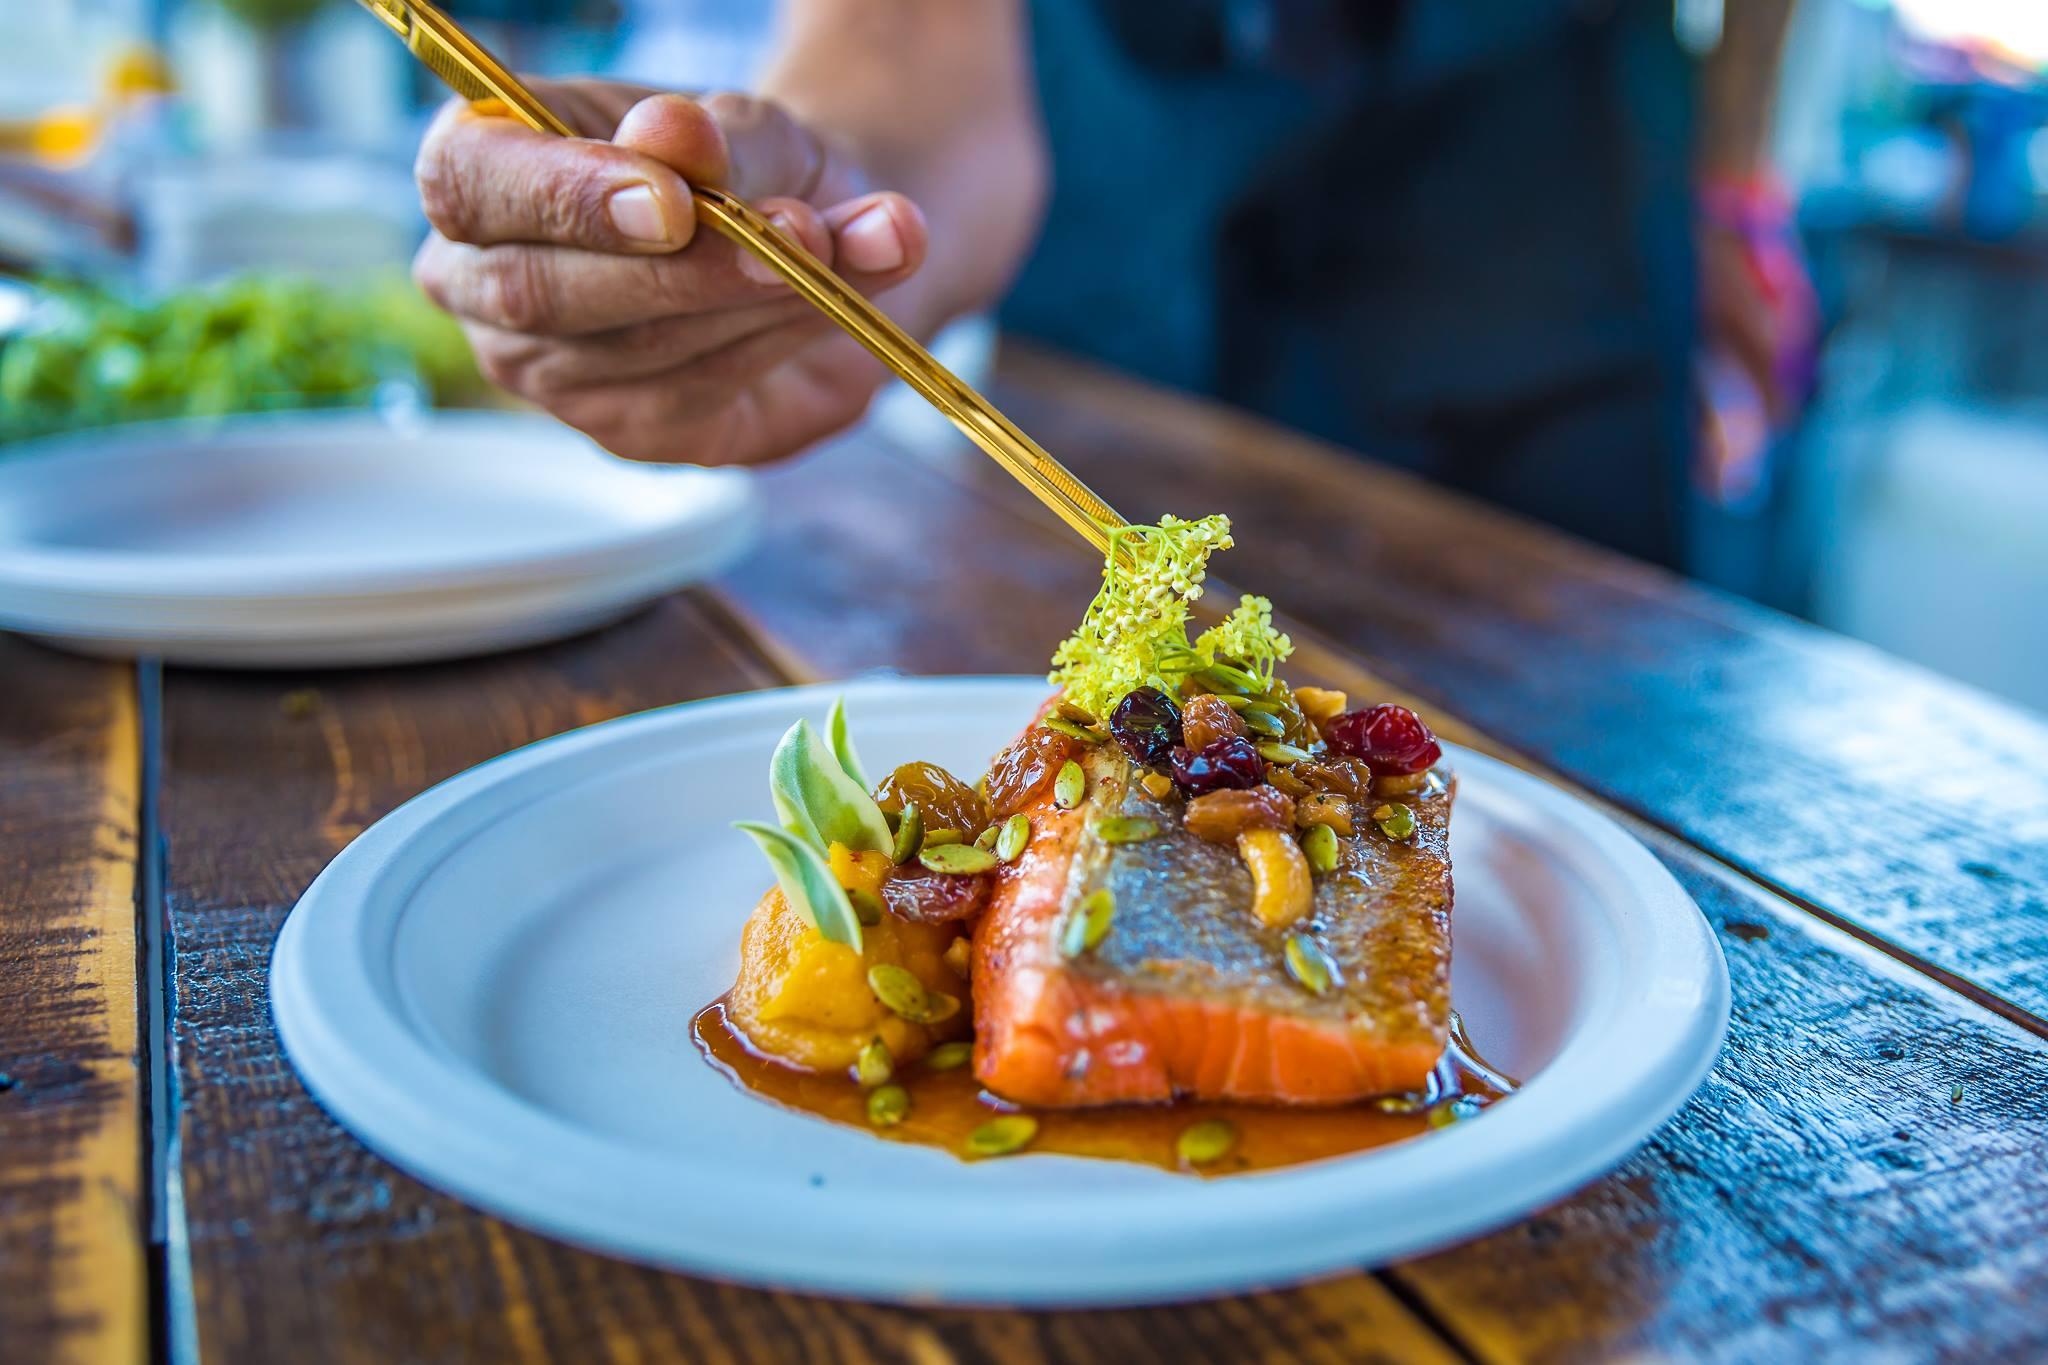 Life is Beautiful food option, ahi tuna on a plate, someone eating with chopsticks